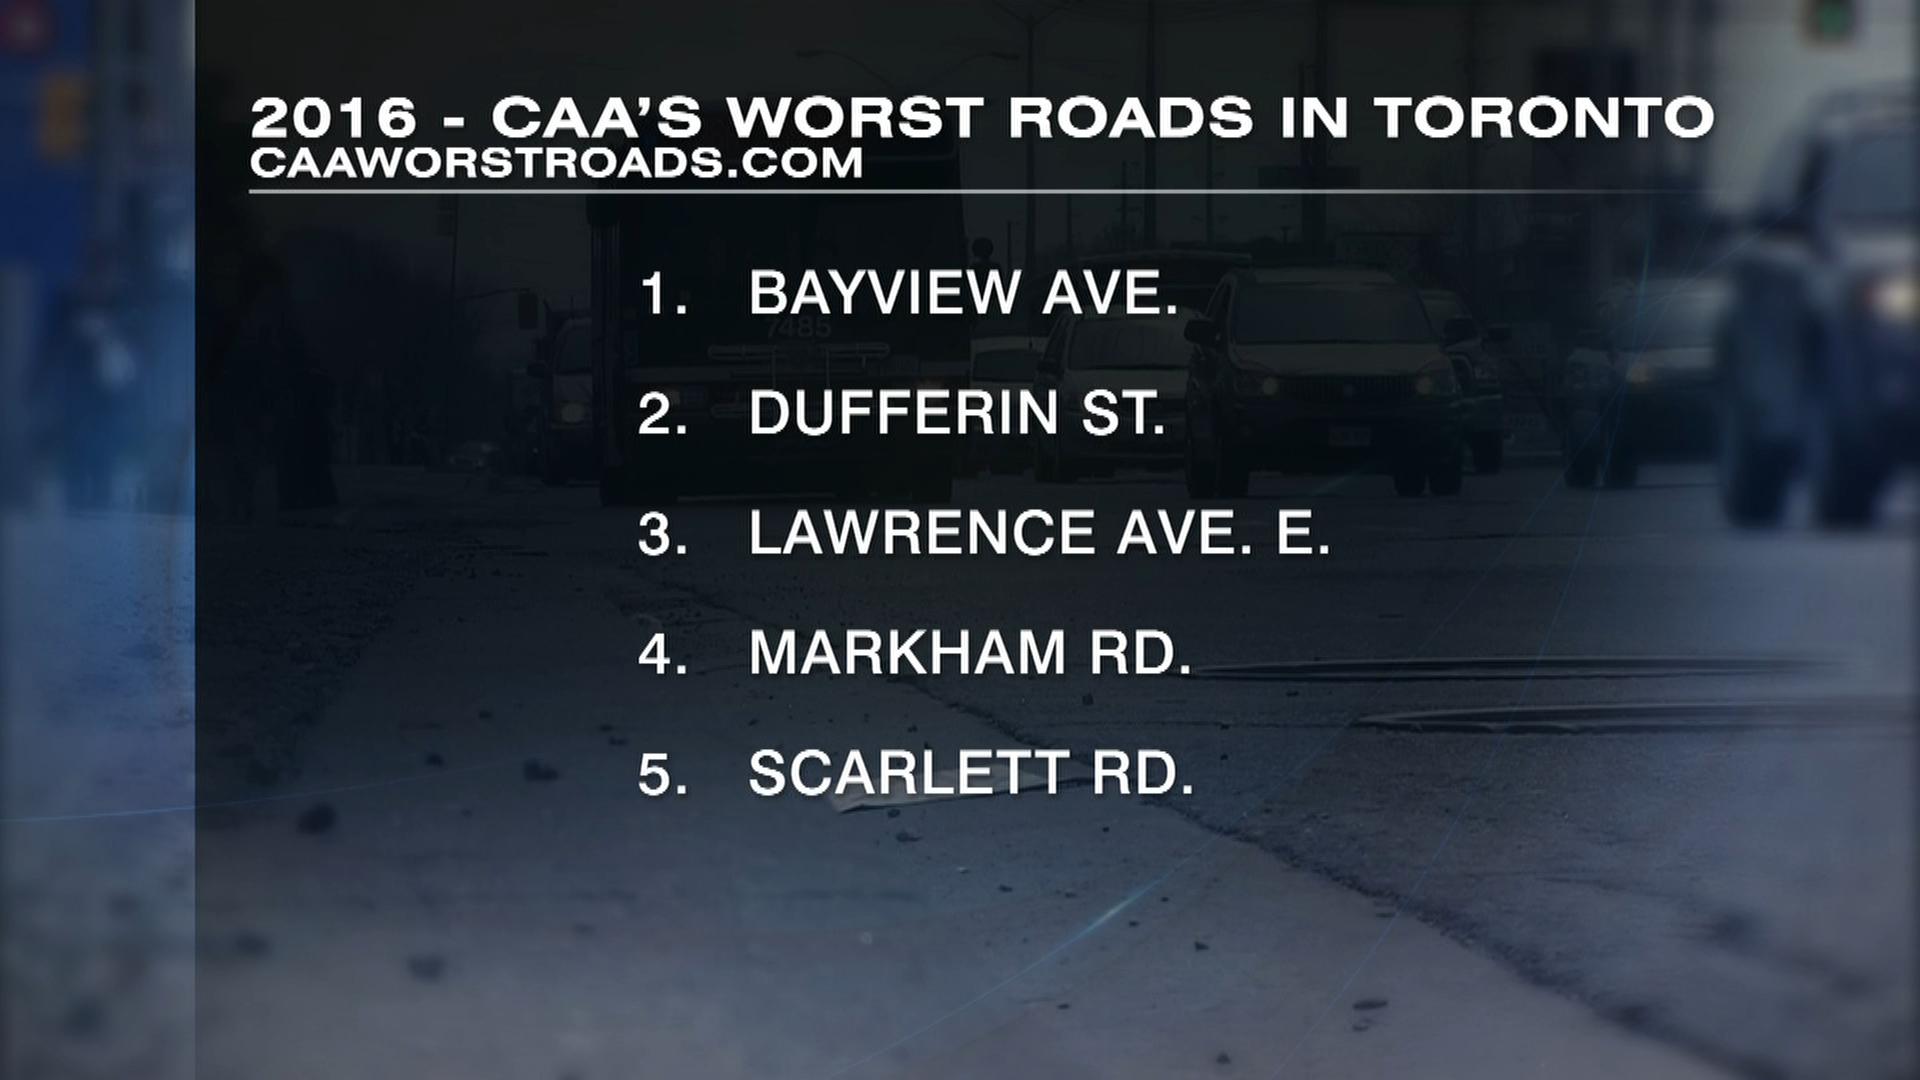 Worst Roads Campaign Not Just About Potholes